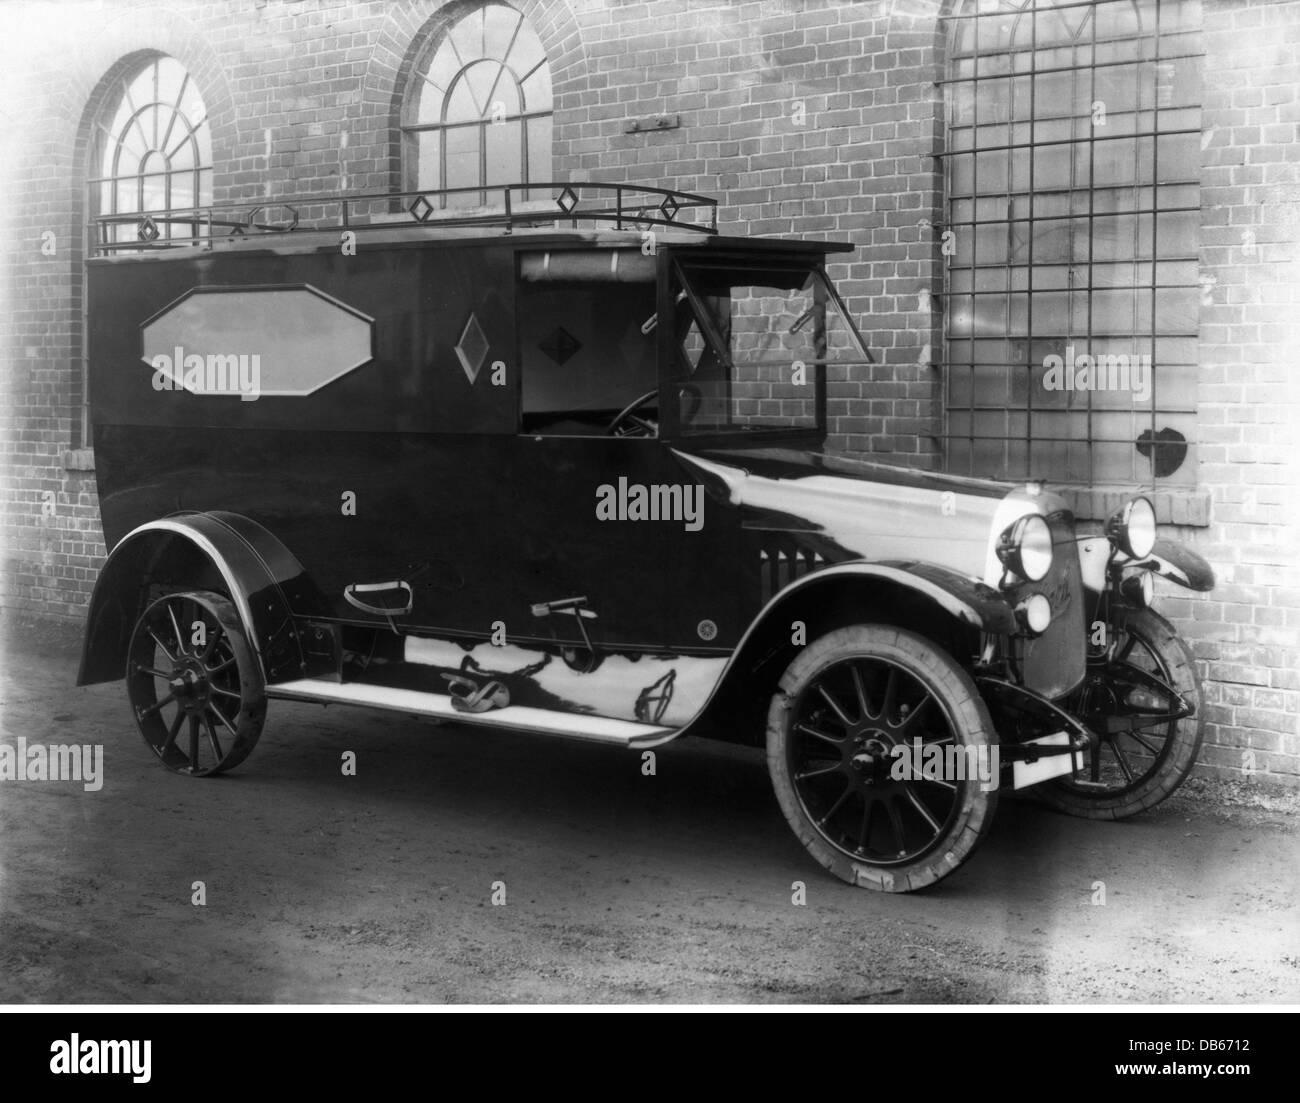 1905 Cars Stock Photos & 1905 Cars Stock Images